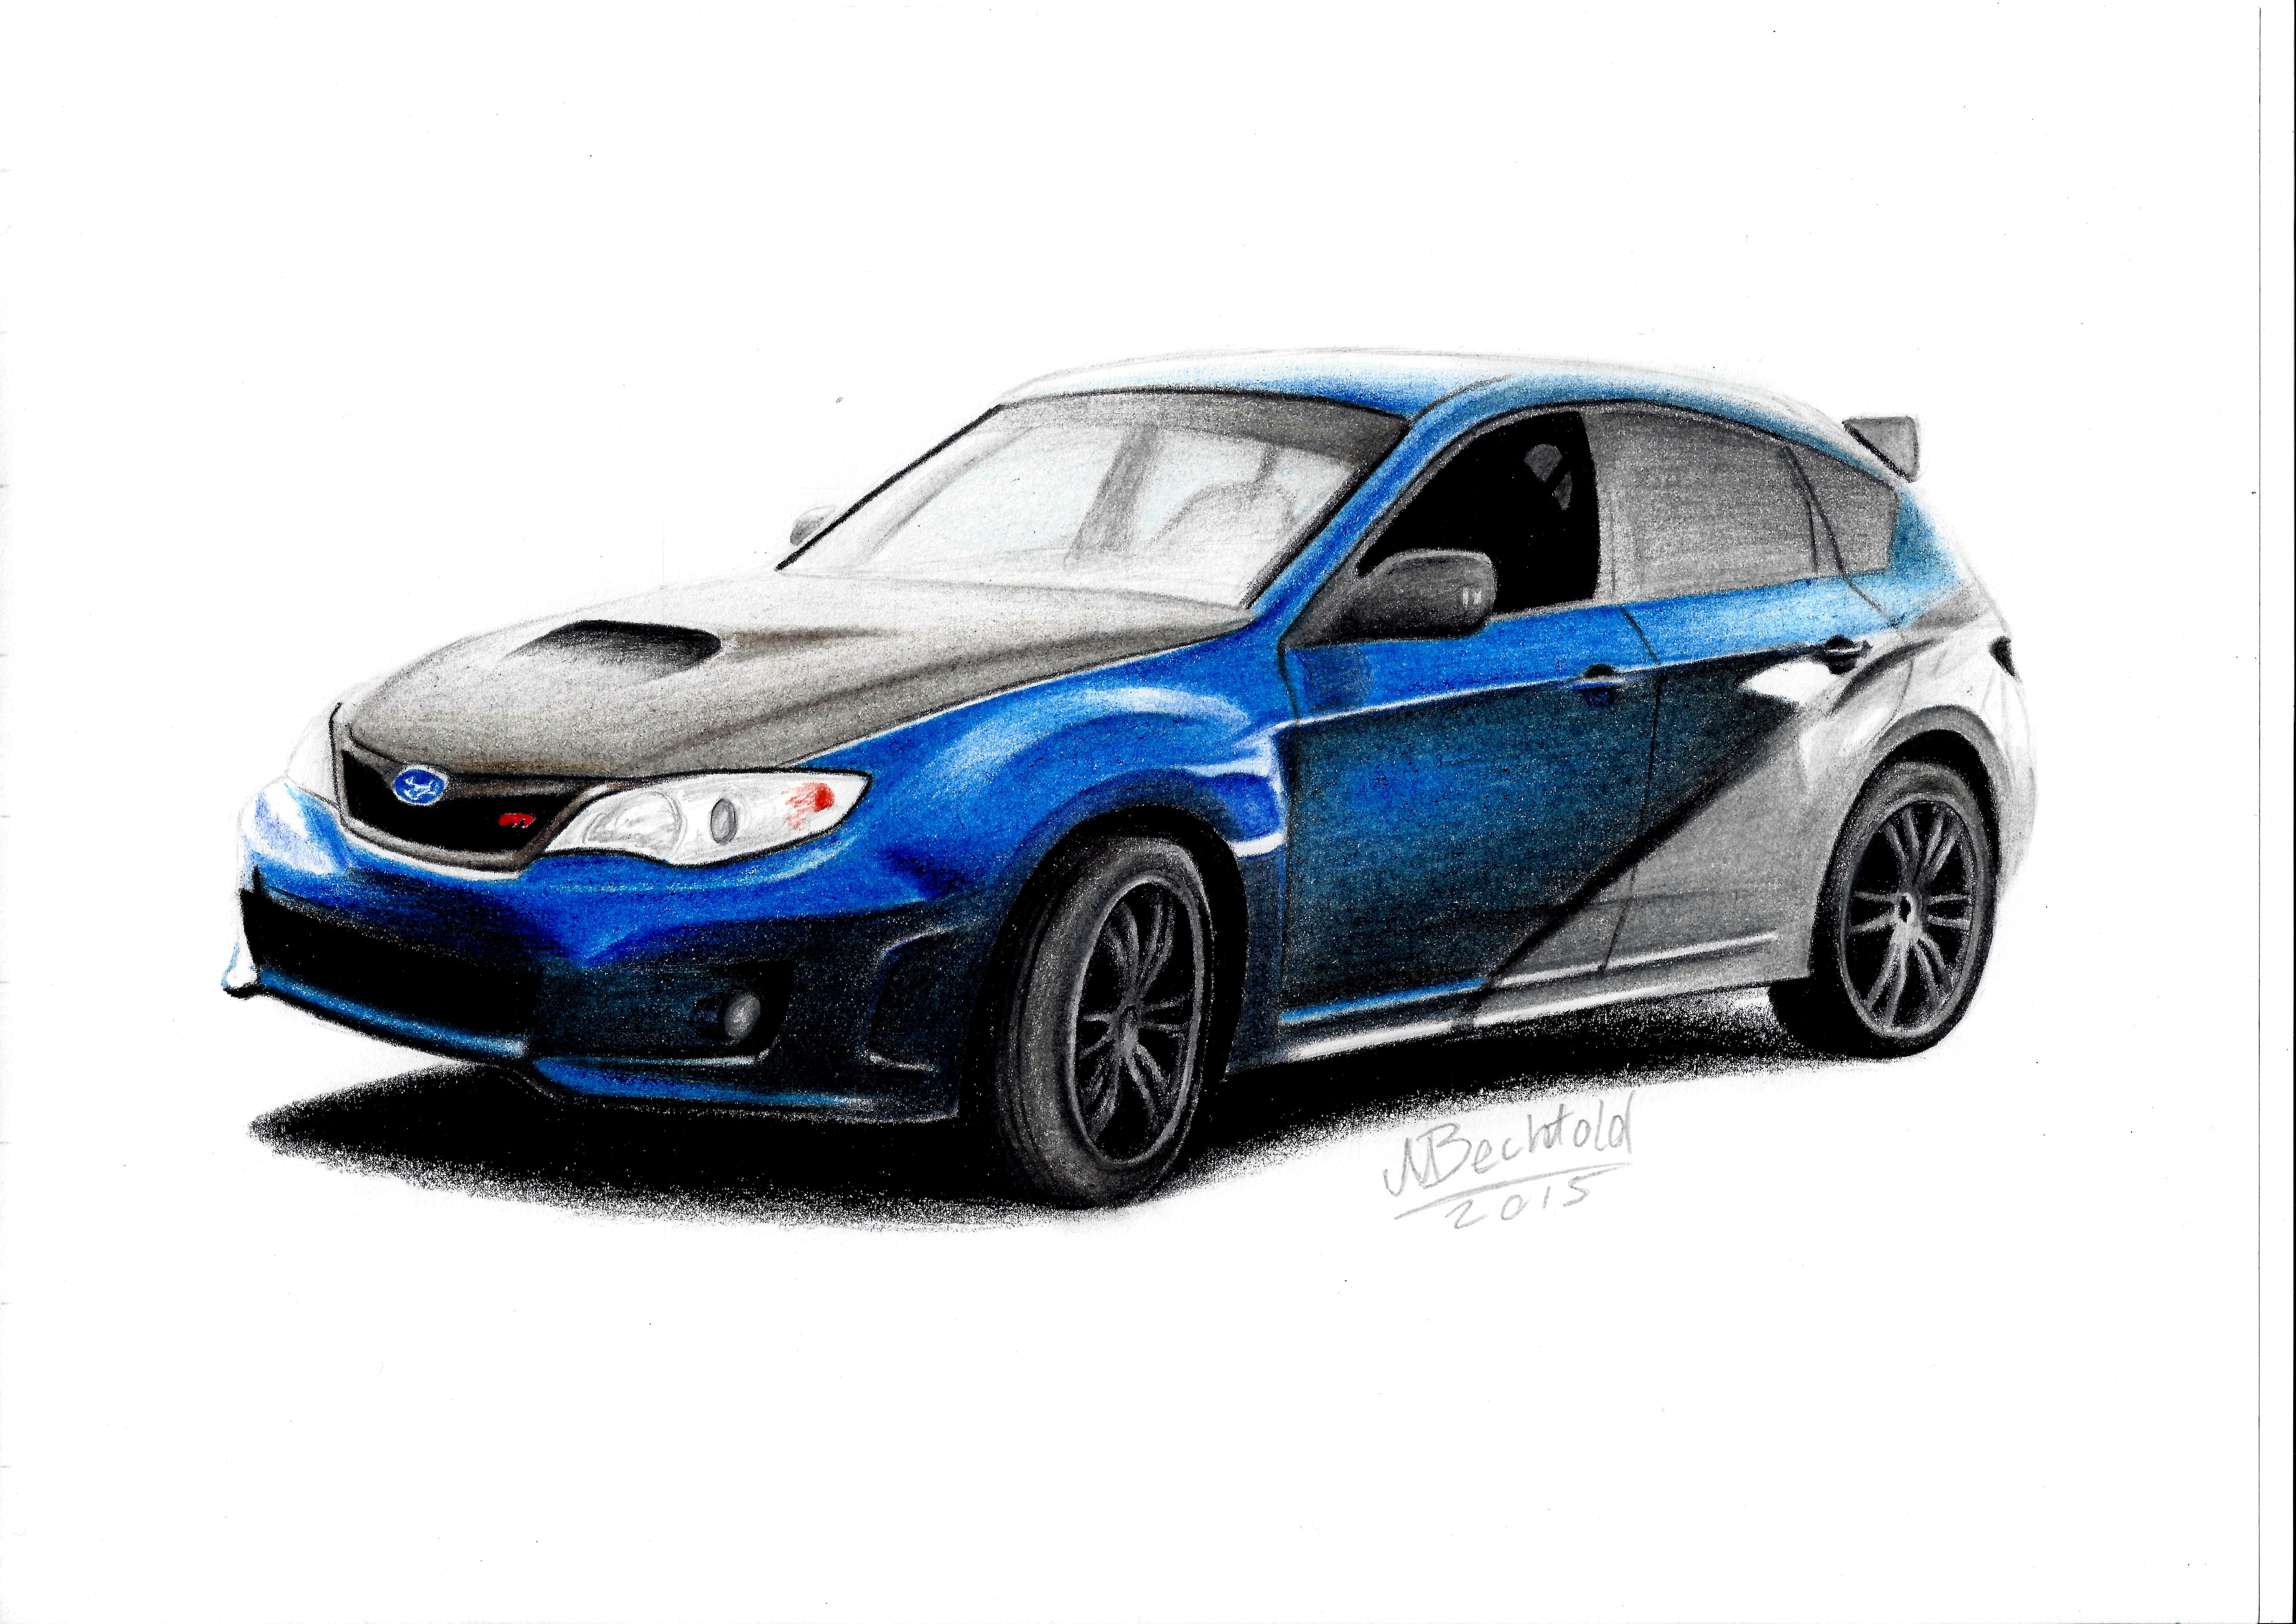 subaru impreza wrx sti fast furious 7 car drawing by maxbechtold on deviantart. Black Bedroom Furniture Sets. Home Design Ideas